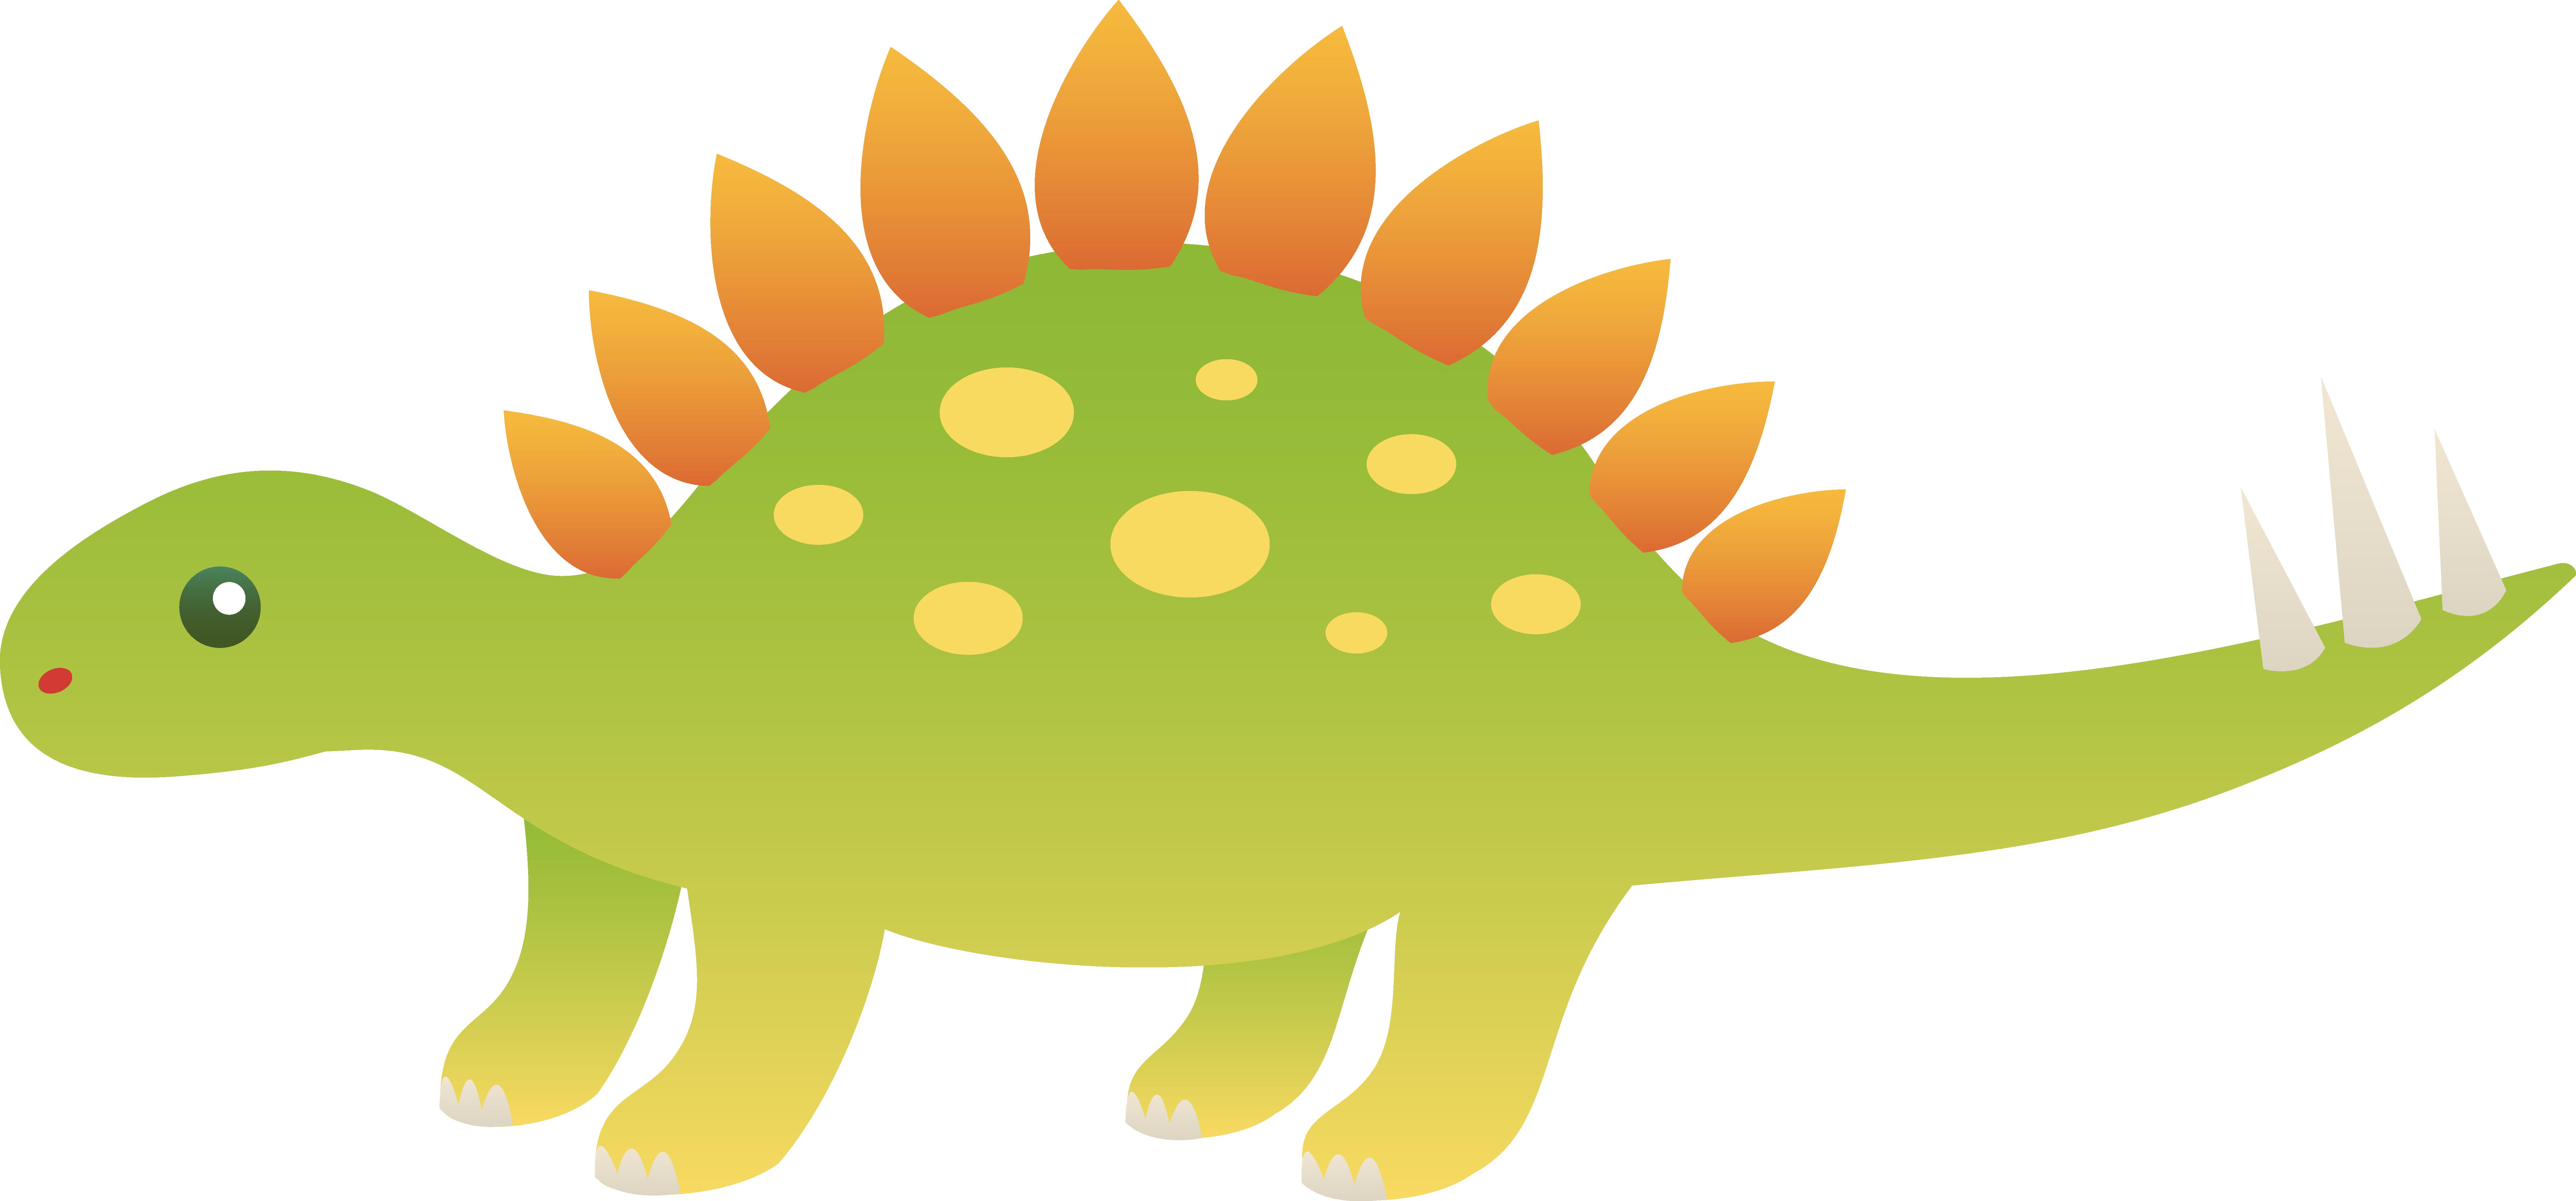 Free Dinosaur Clipart Clip Art Pictures -Free dinosaur clipart clip art pictures graphics and illustrations 2 - Clipartix-17